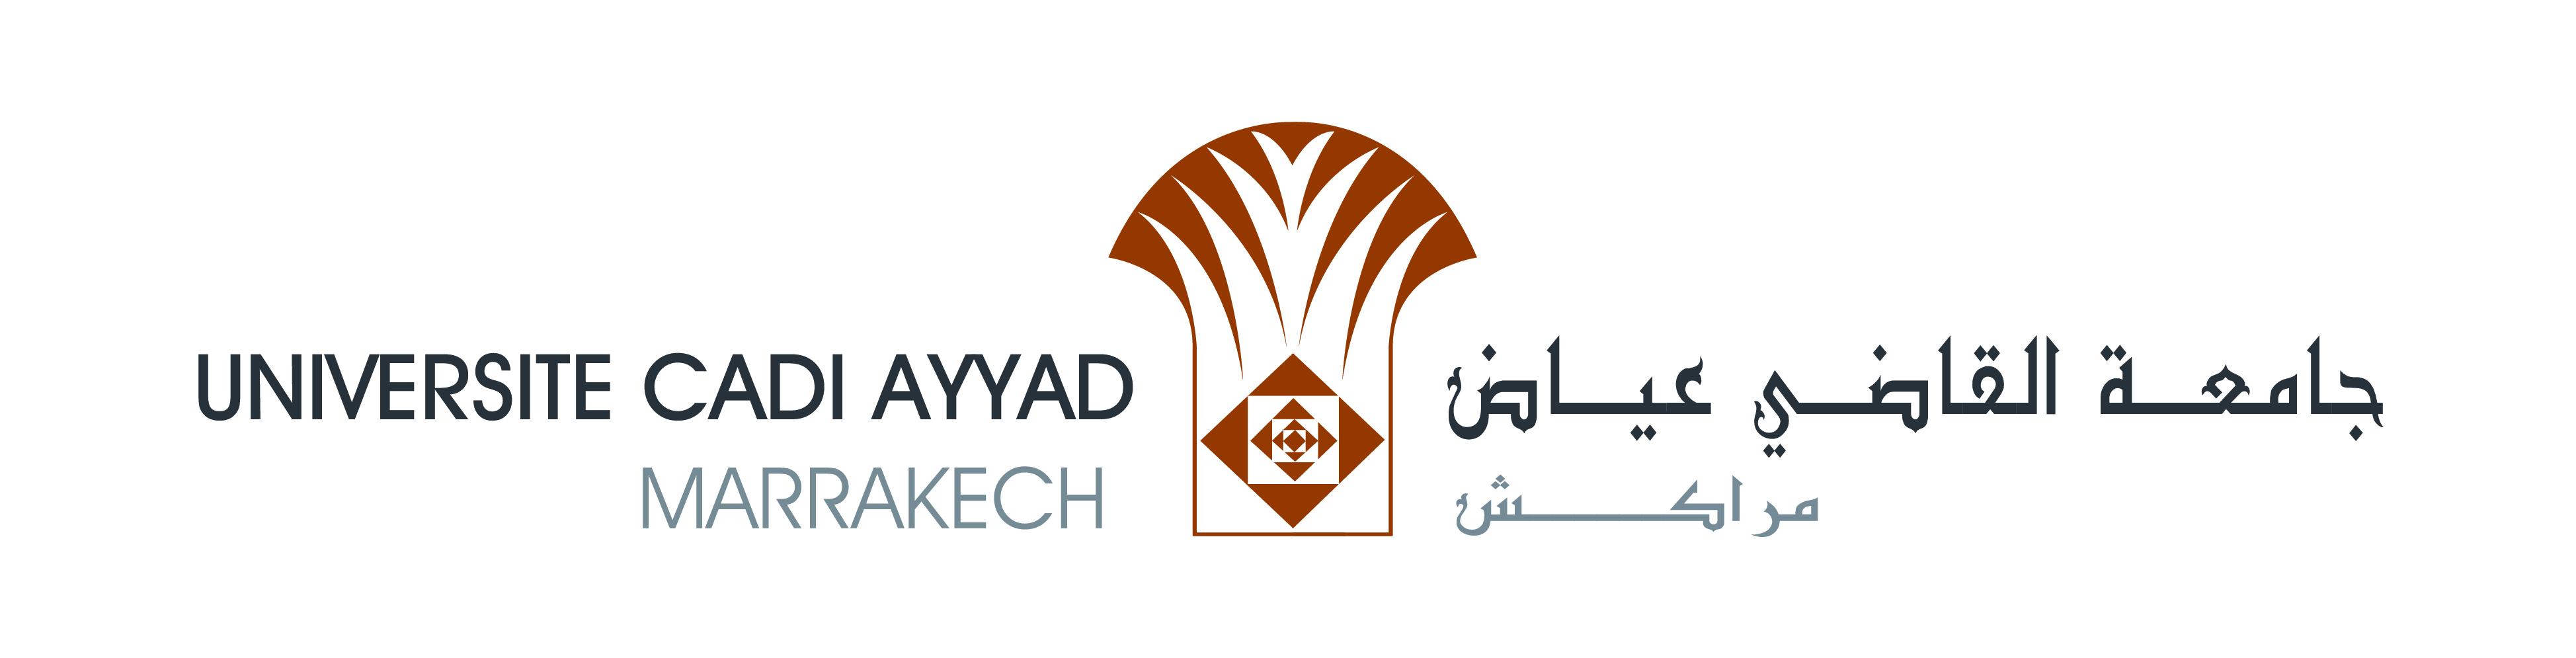 logo universidad marrakech